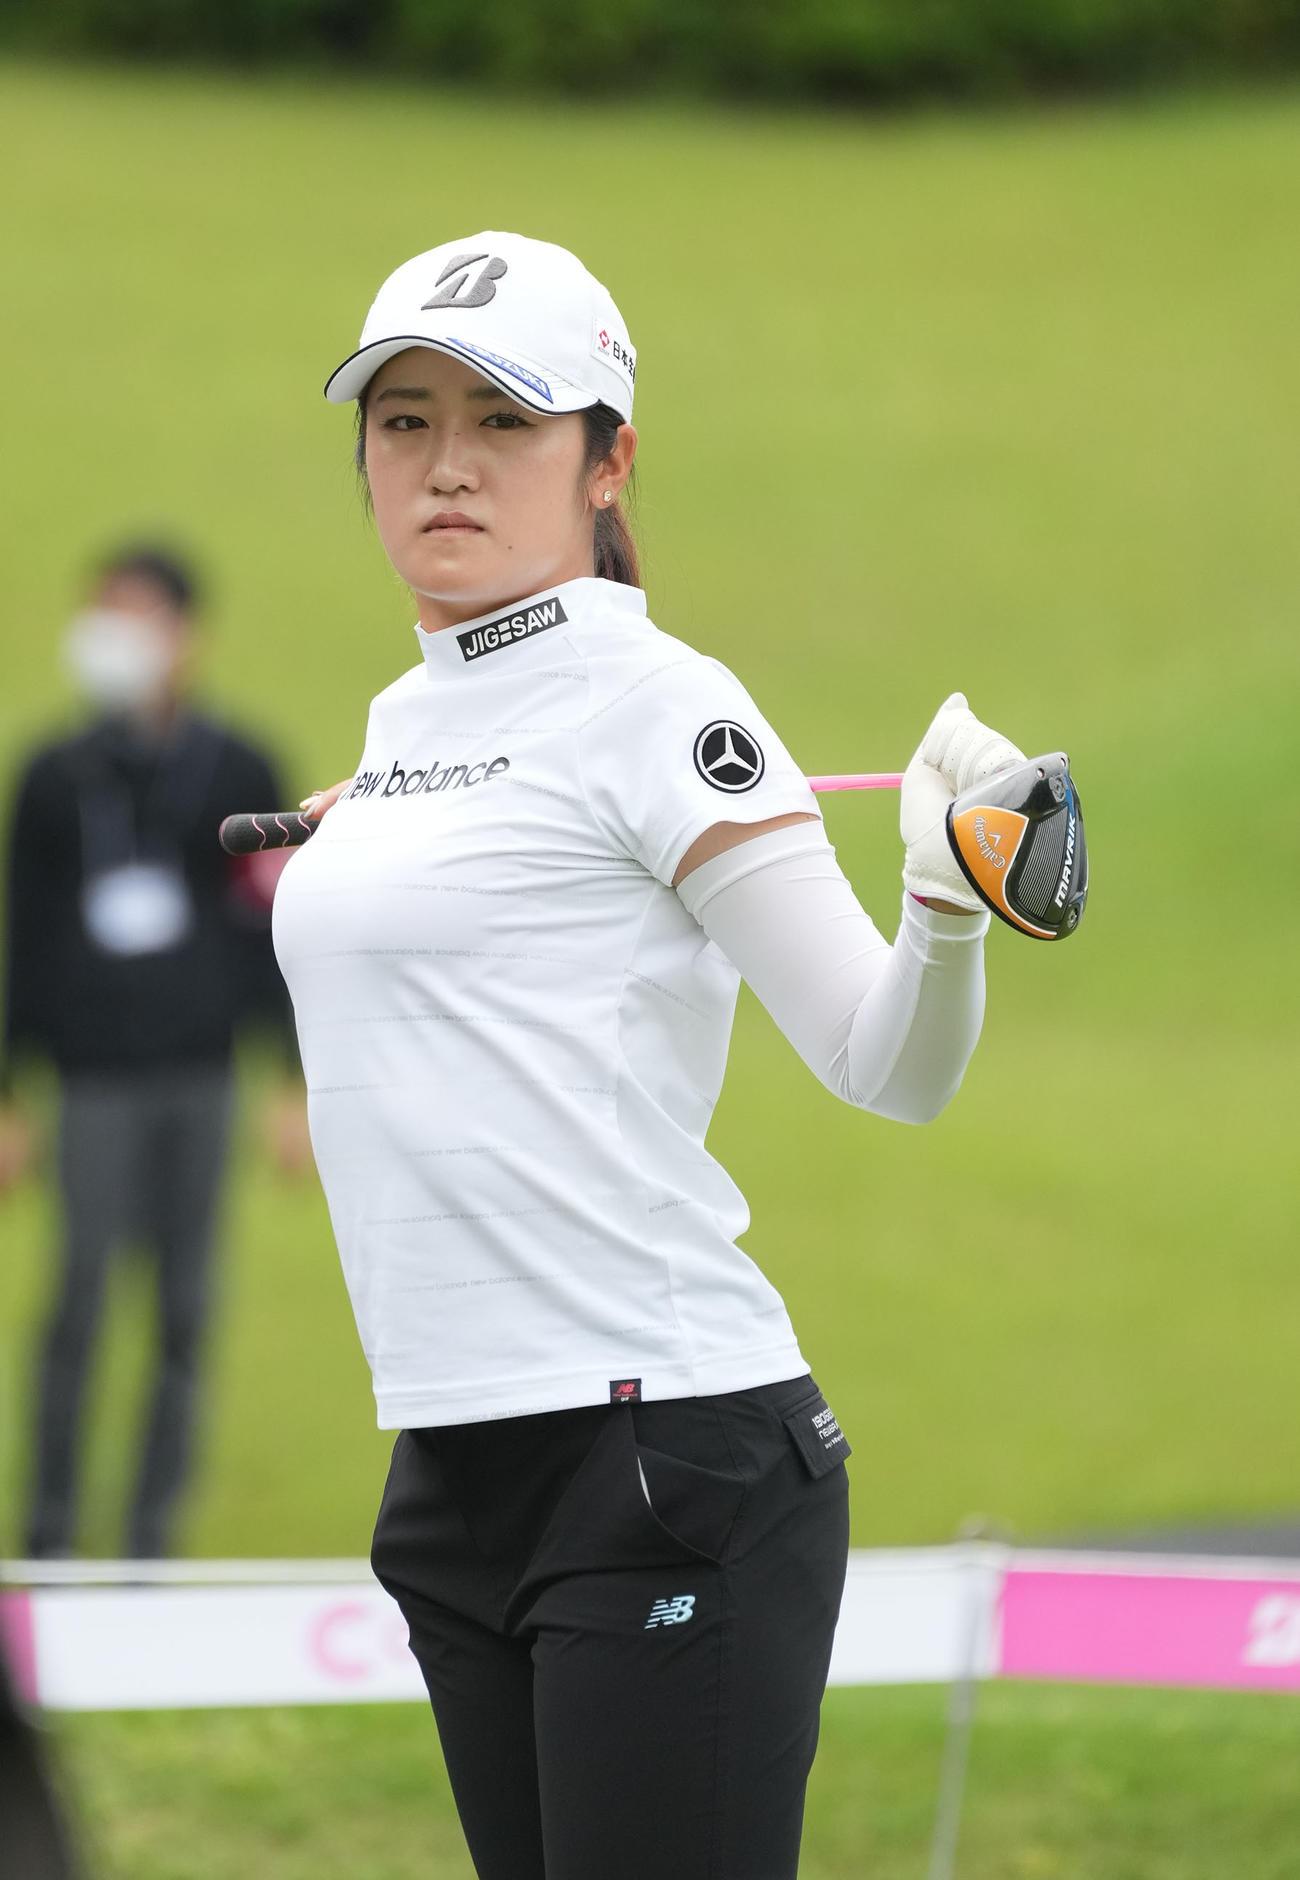 https://www.nikkansports.com/sports/golf/news/img/202105220000525-w1300_1.jpg